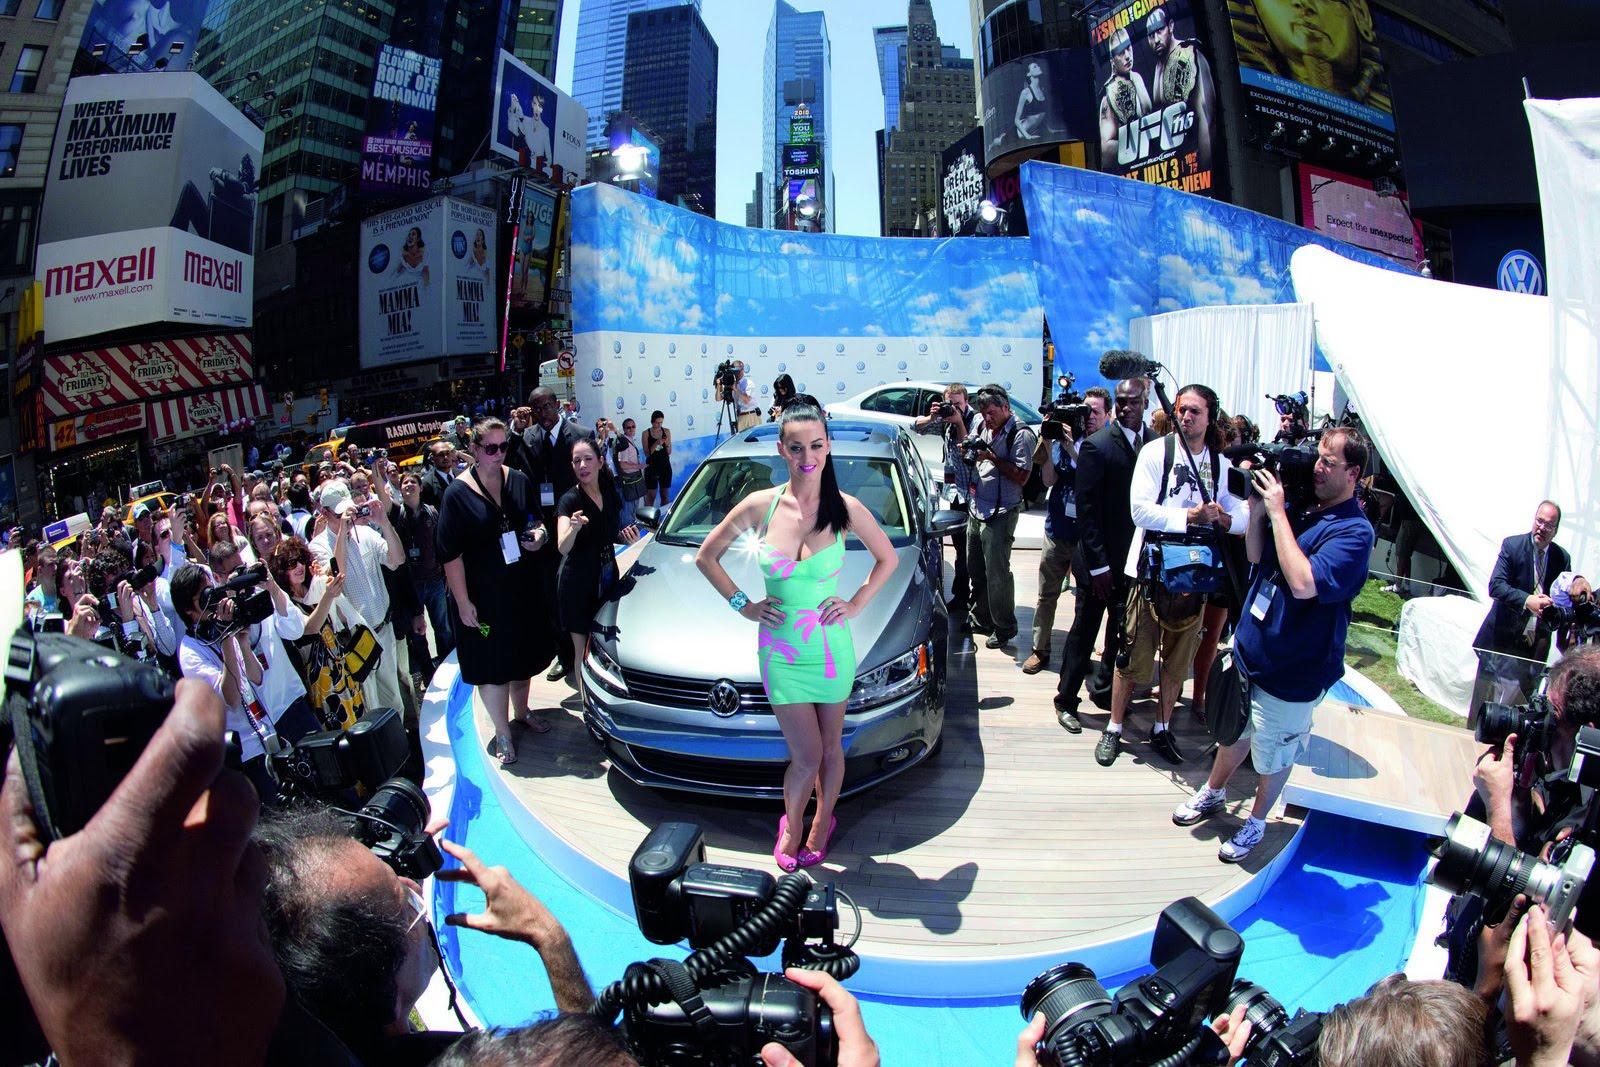 http://3.bp.blogspot.com/_FoXyvaPSnVk/TBlb2uy13wI/AAAAAAAC-BE/lagI0Tx3Z0k/s1600/2011-Volkswagen-Jetta-New-York-29.jpg